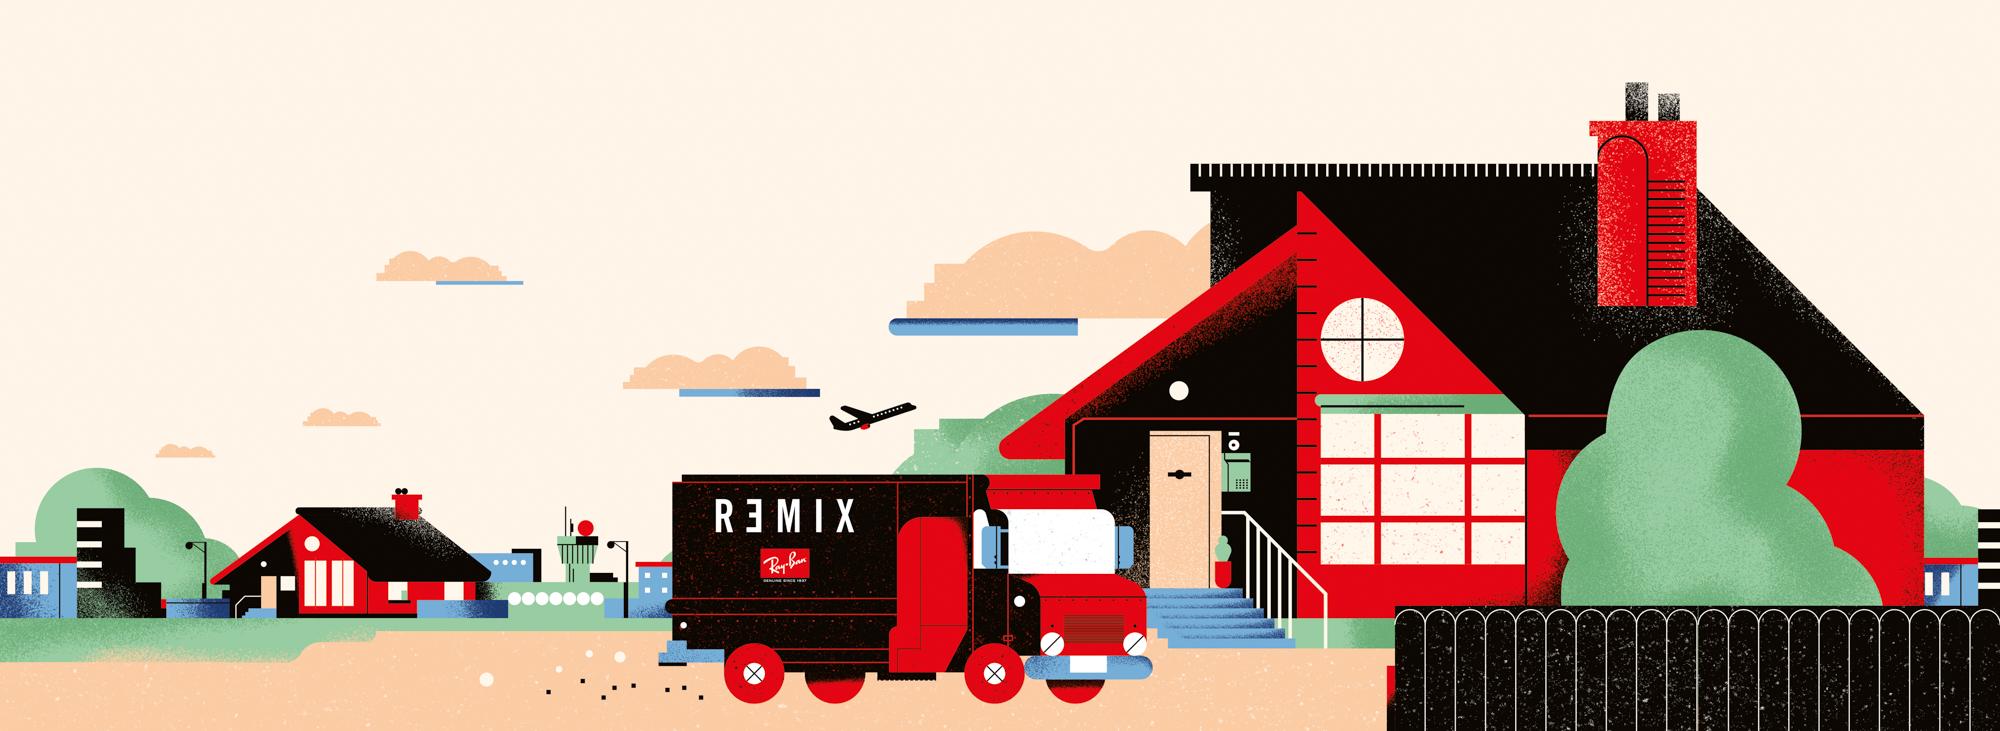 rayban remix hamptons trip